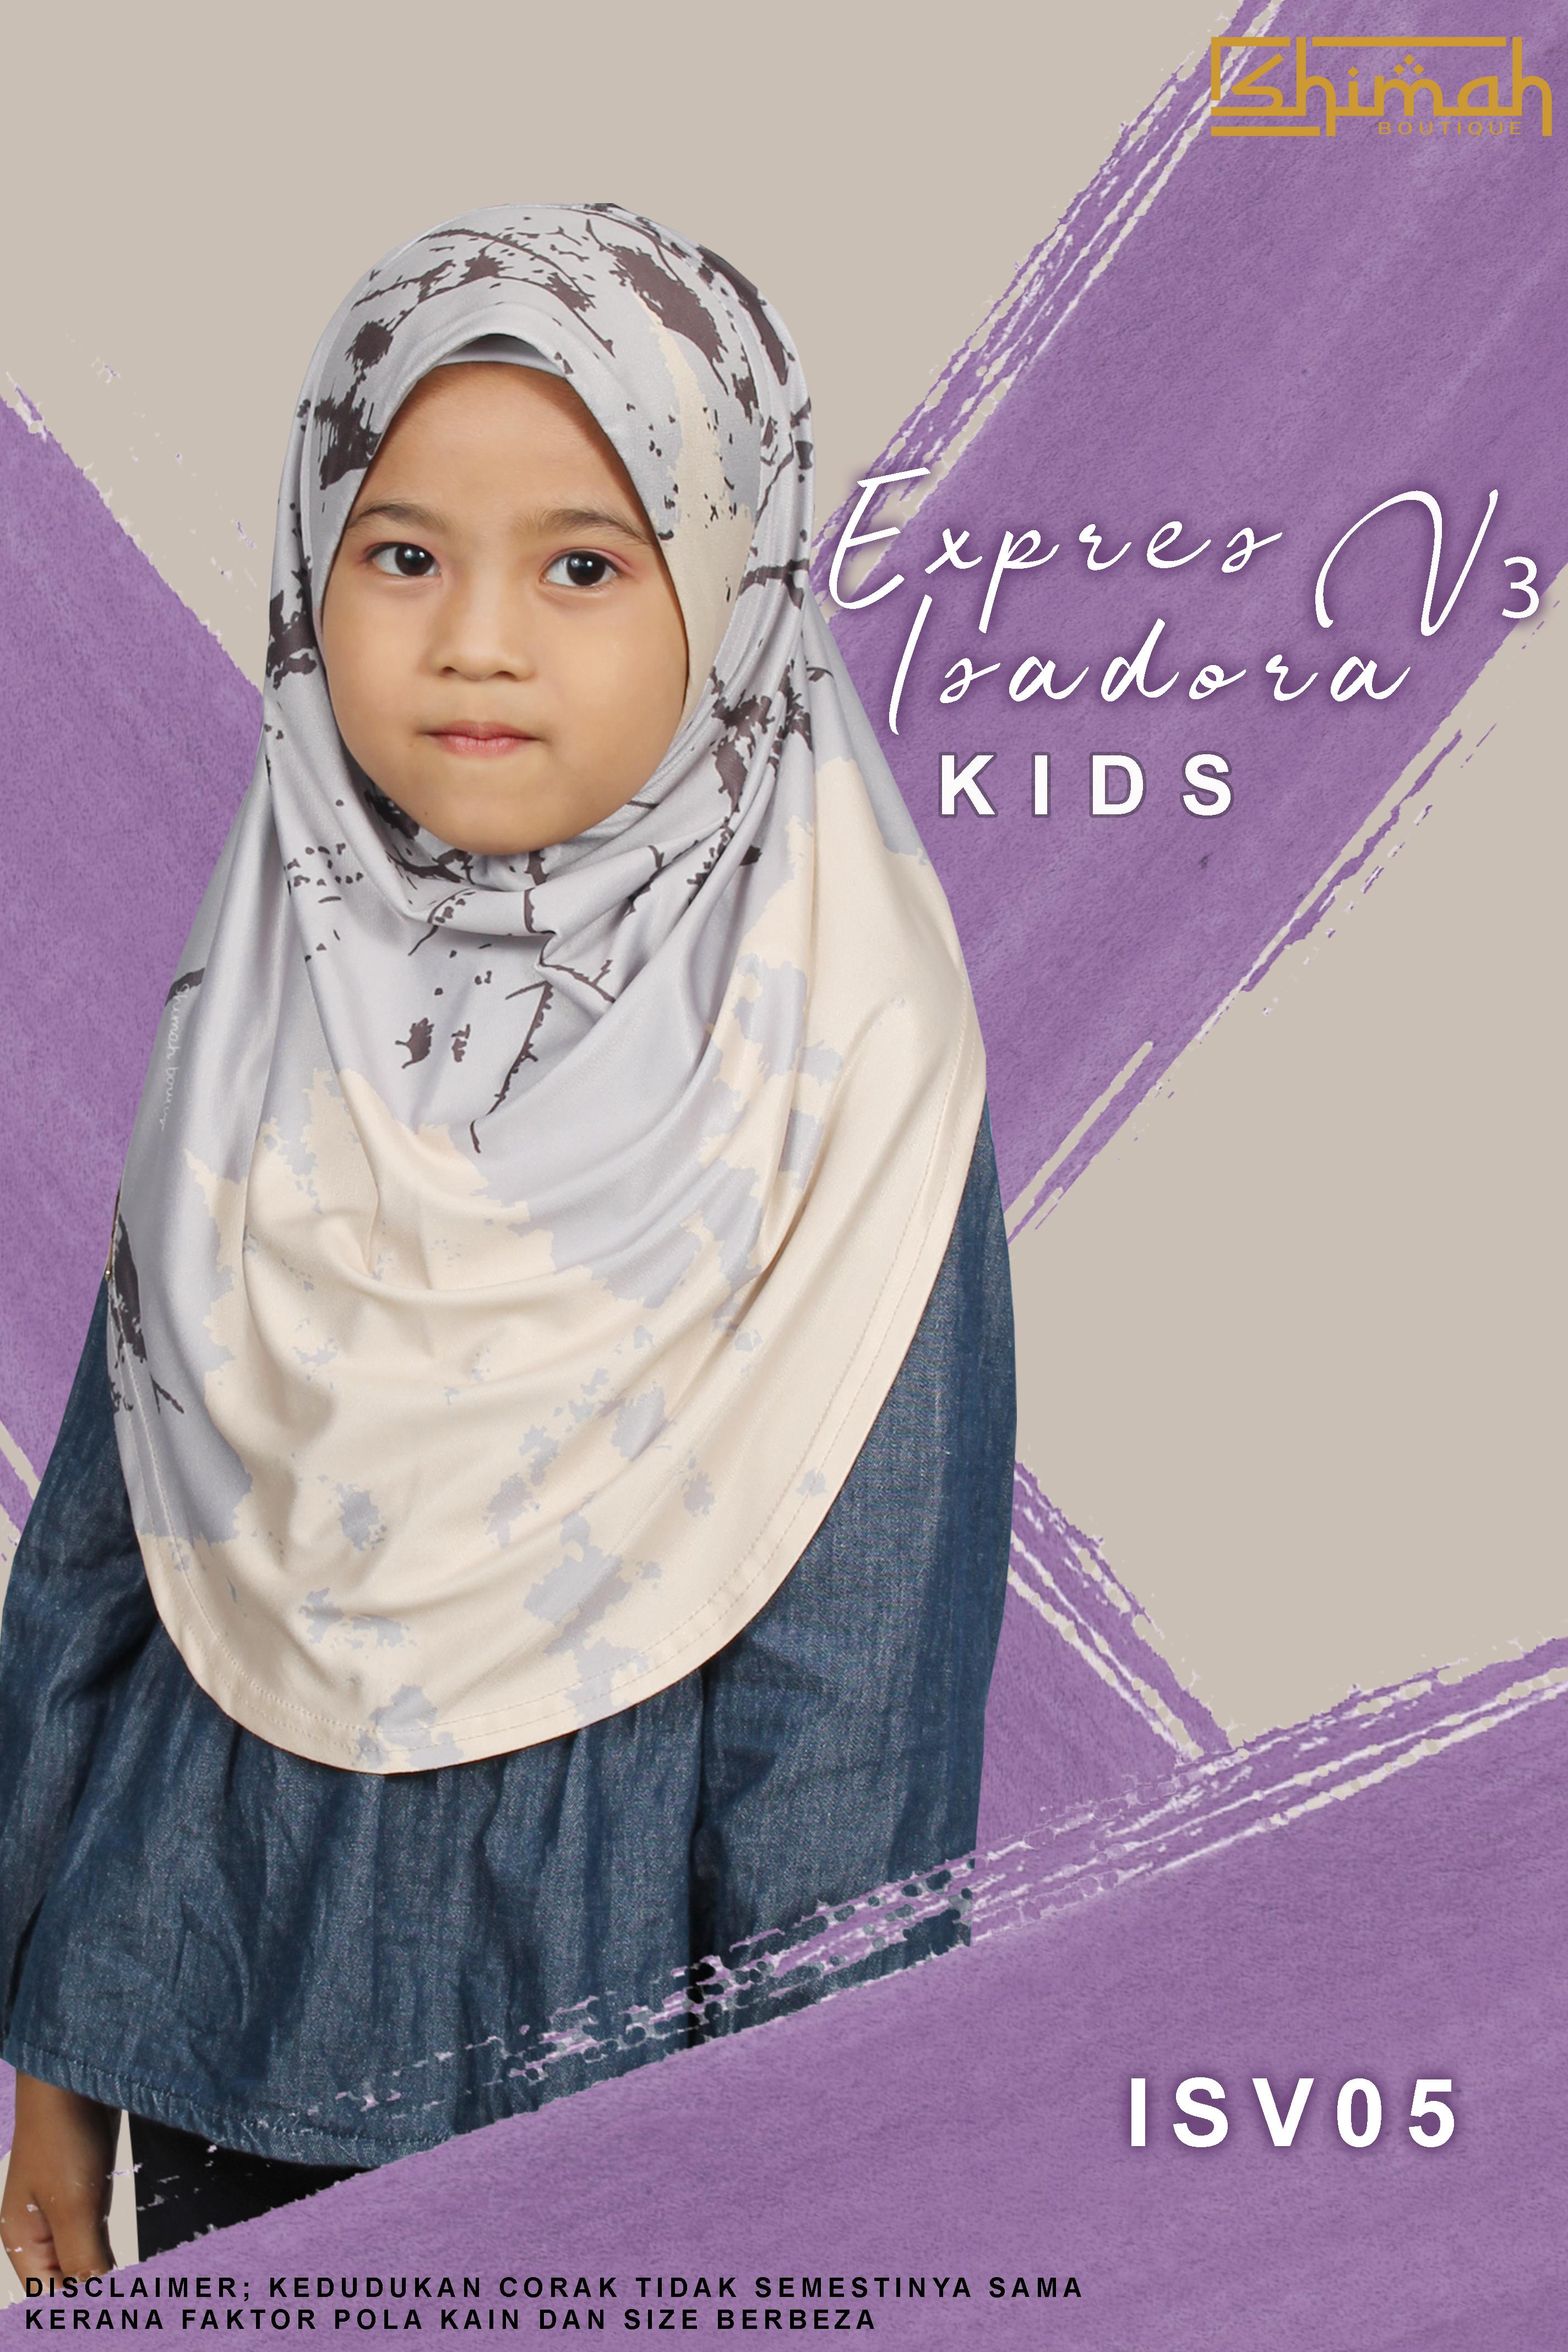 Express Isadora Kids V3 - ISKV05